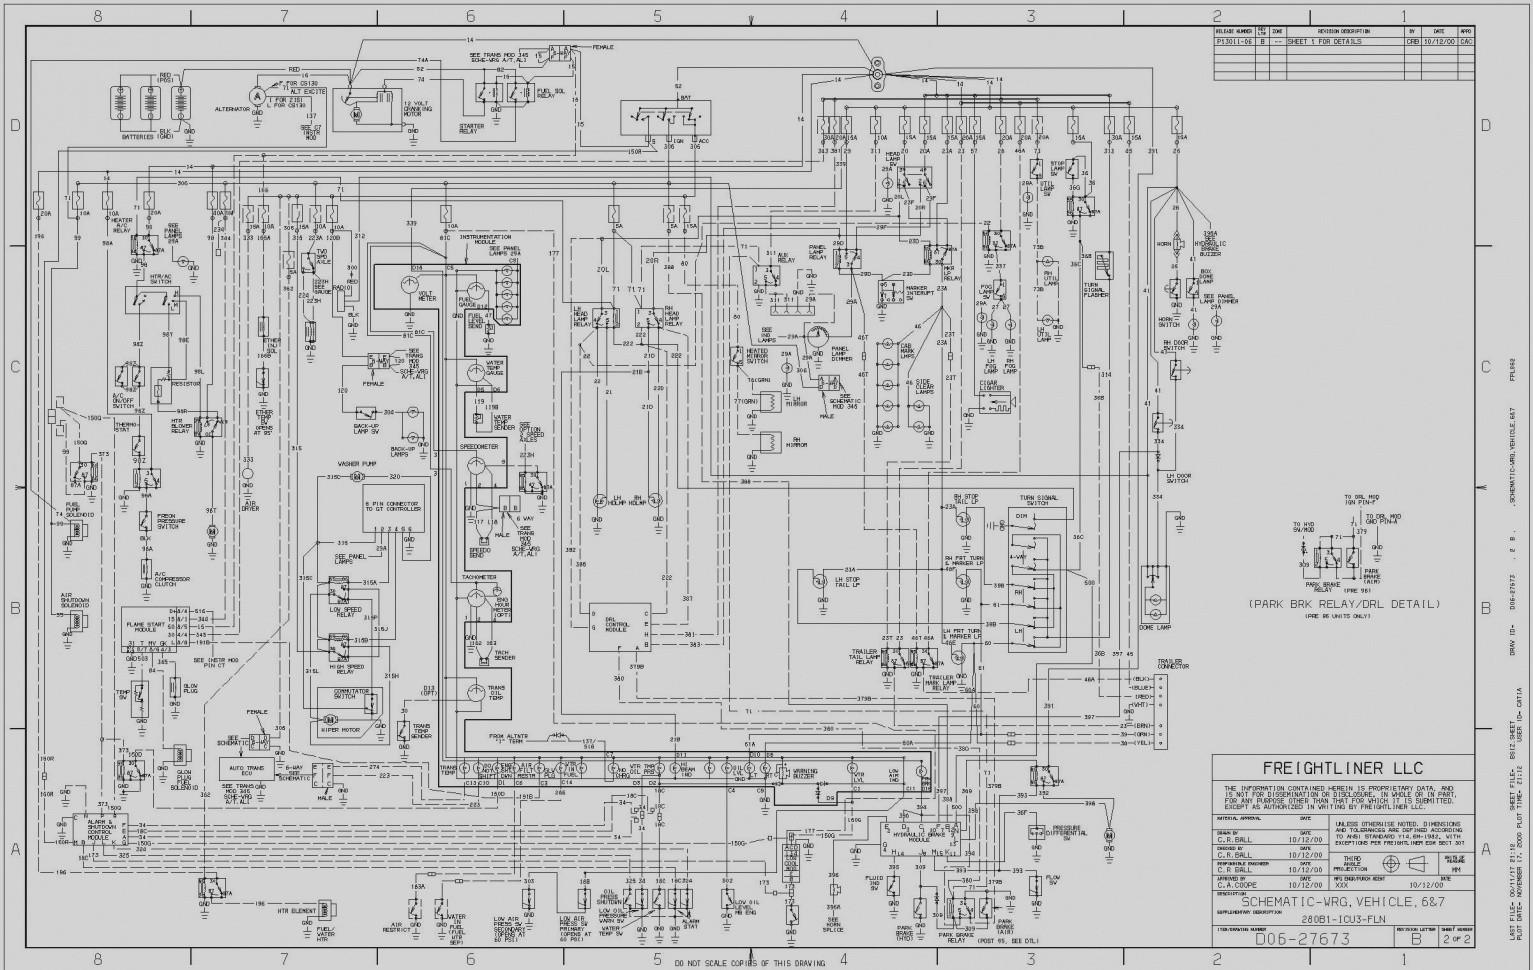 Diagram 1997 Fld 112 Wiring Diagram Full Version Hd Quality Wiring Diagram Diagramgriggs Apd Audax It